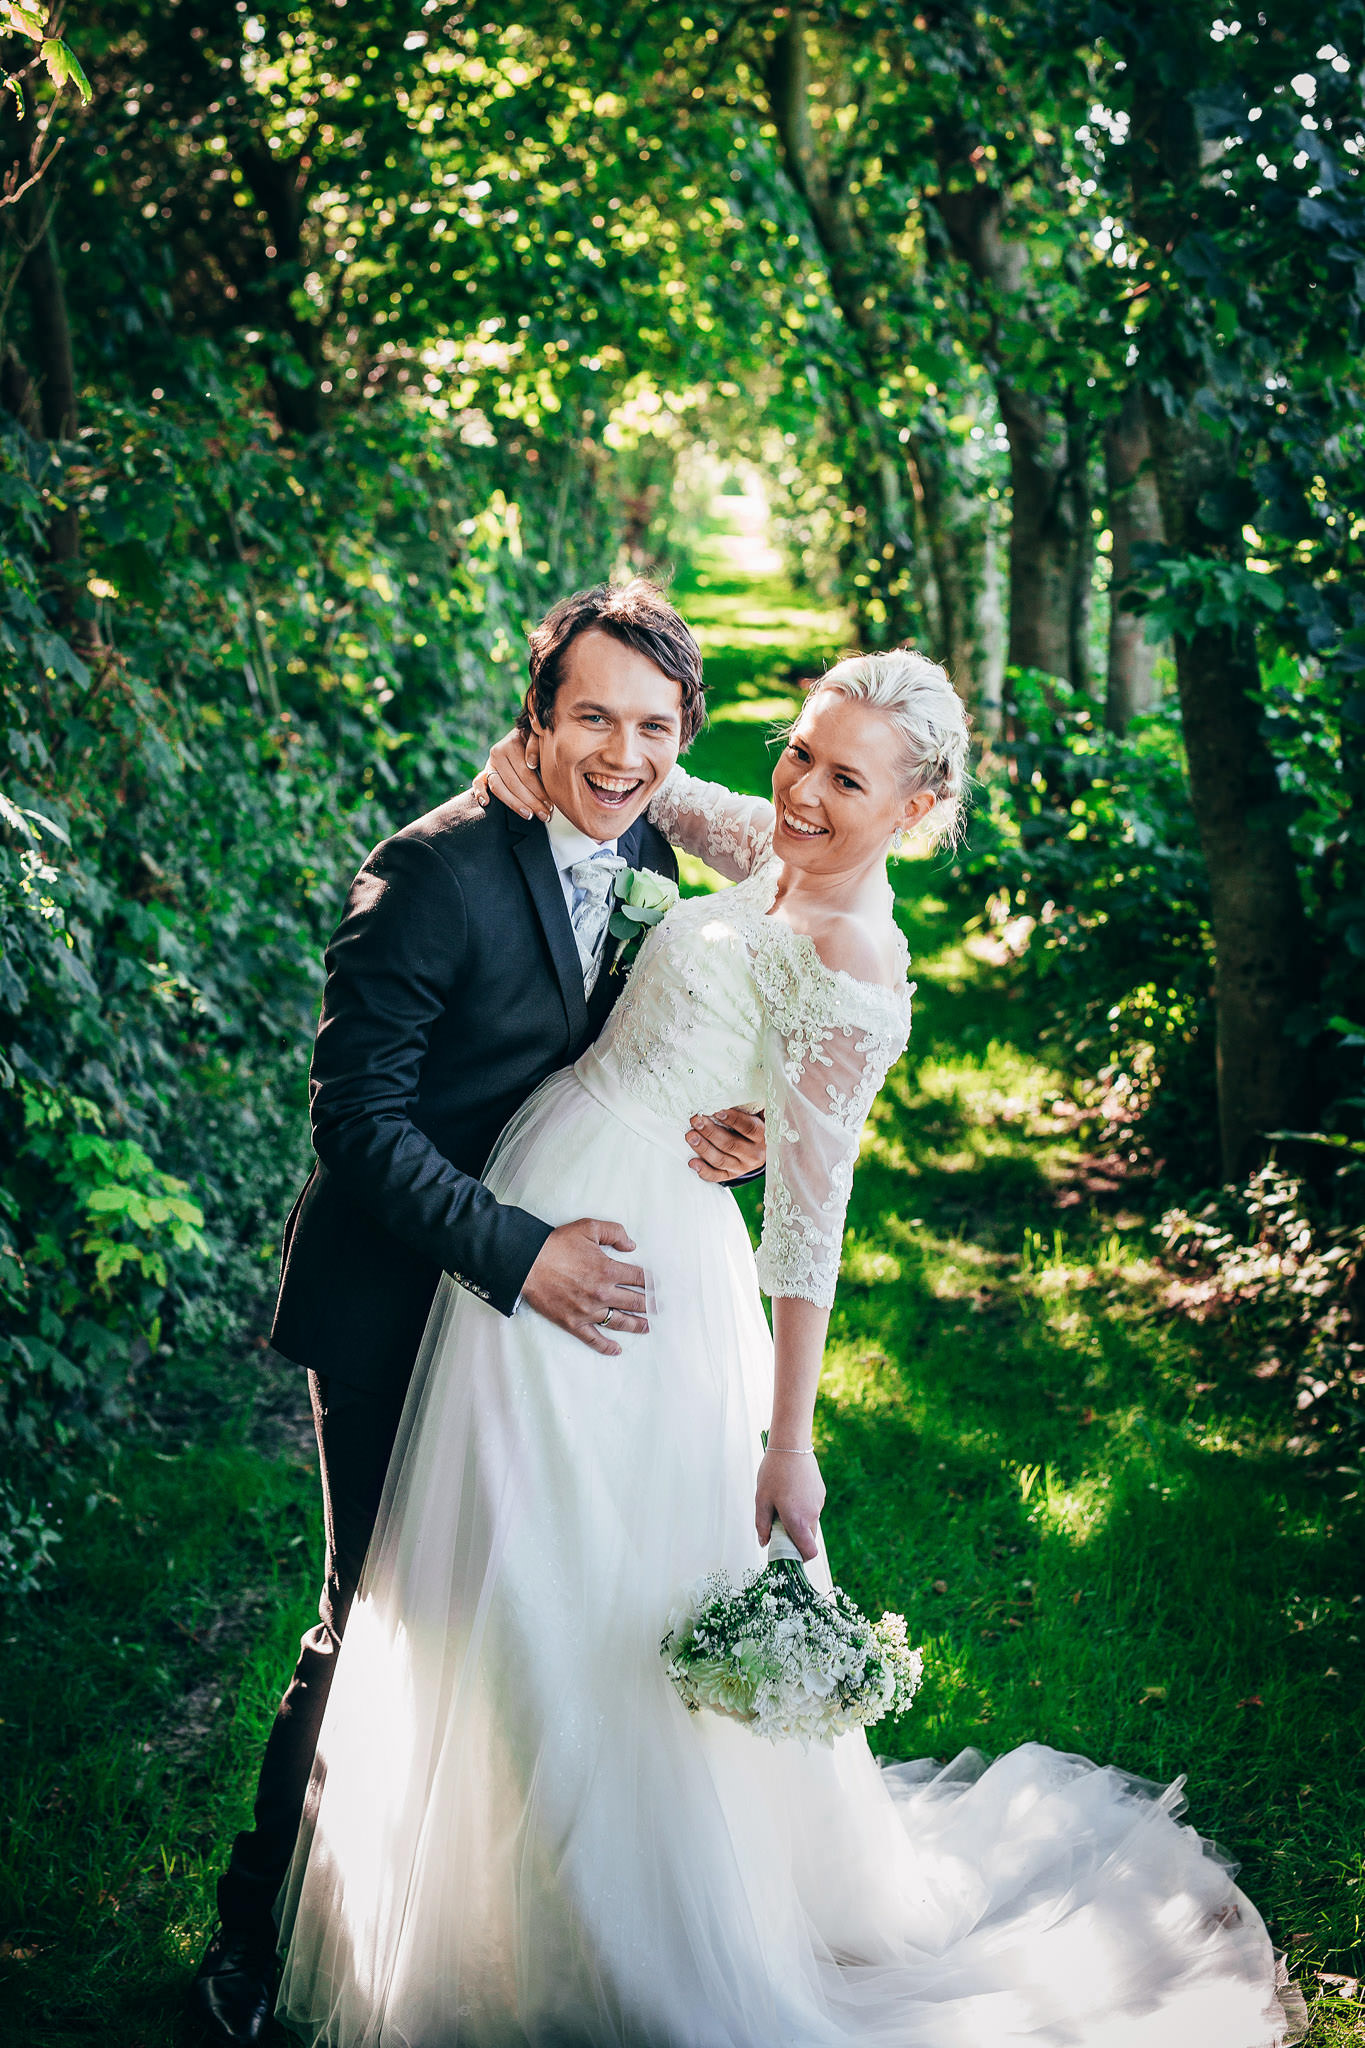 Wedding+Photographer+Norway+Bryllupsfotograf+Casey+Arneson+JT-108.jpg